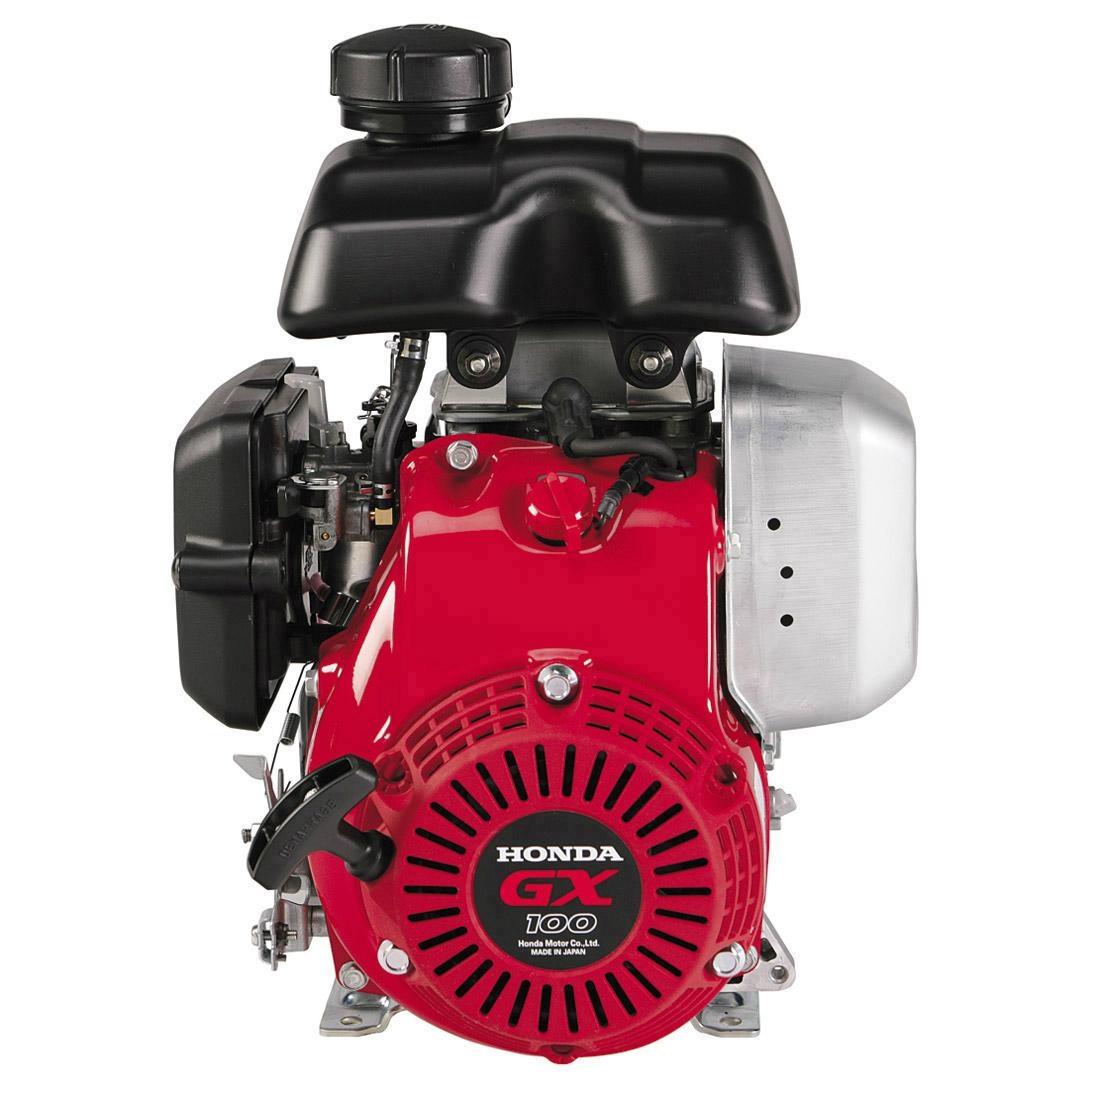 Honda GX100 Air-Cooled 4-Stroke OHC Engine 1